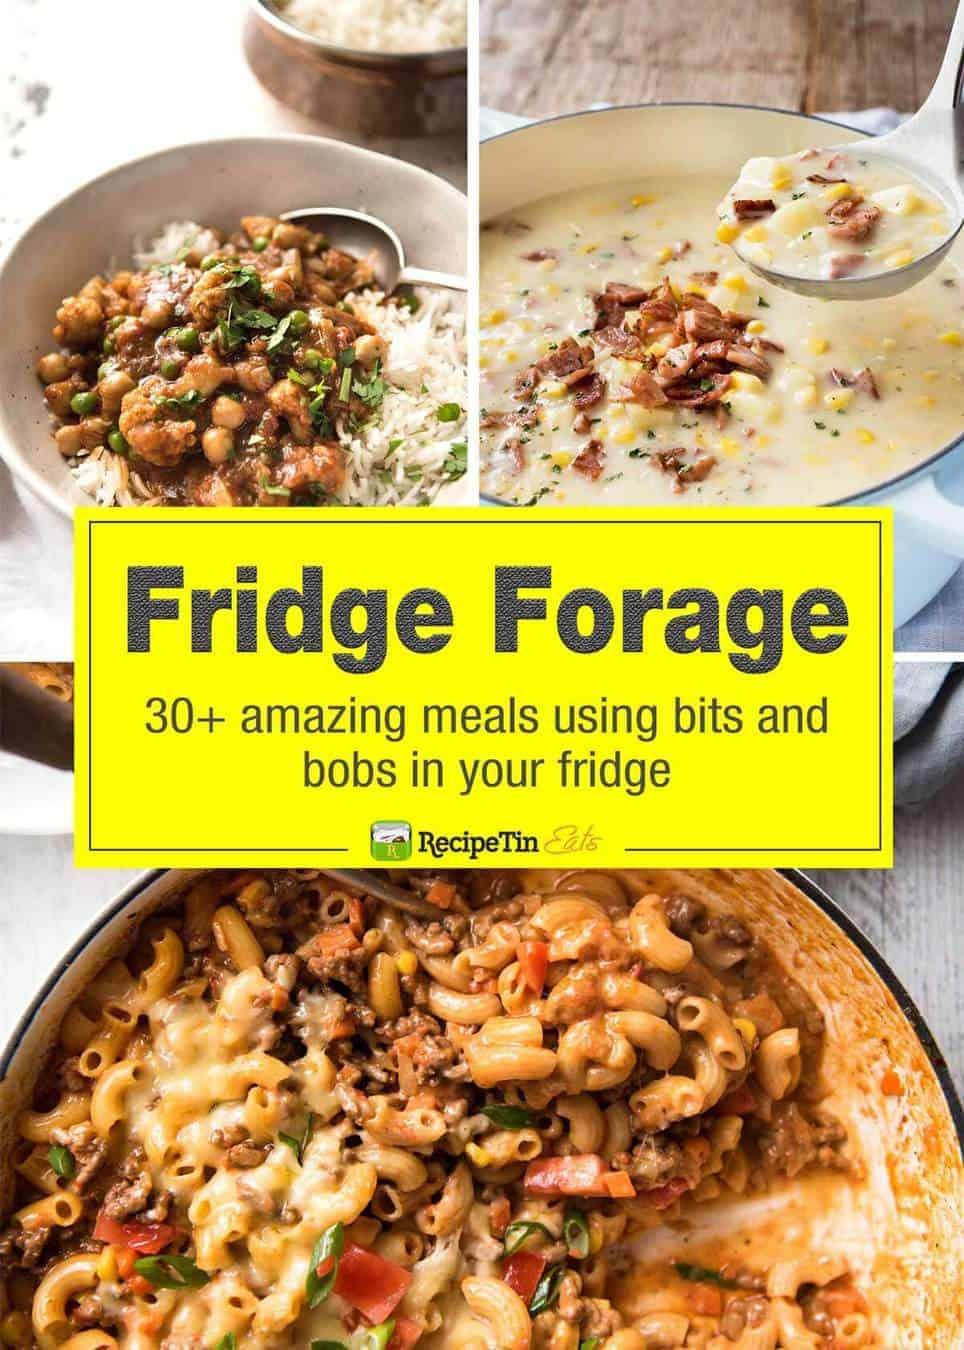 Fridge-forage-1